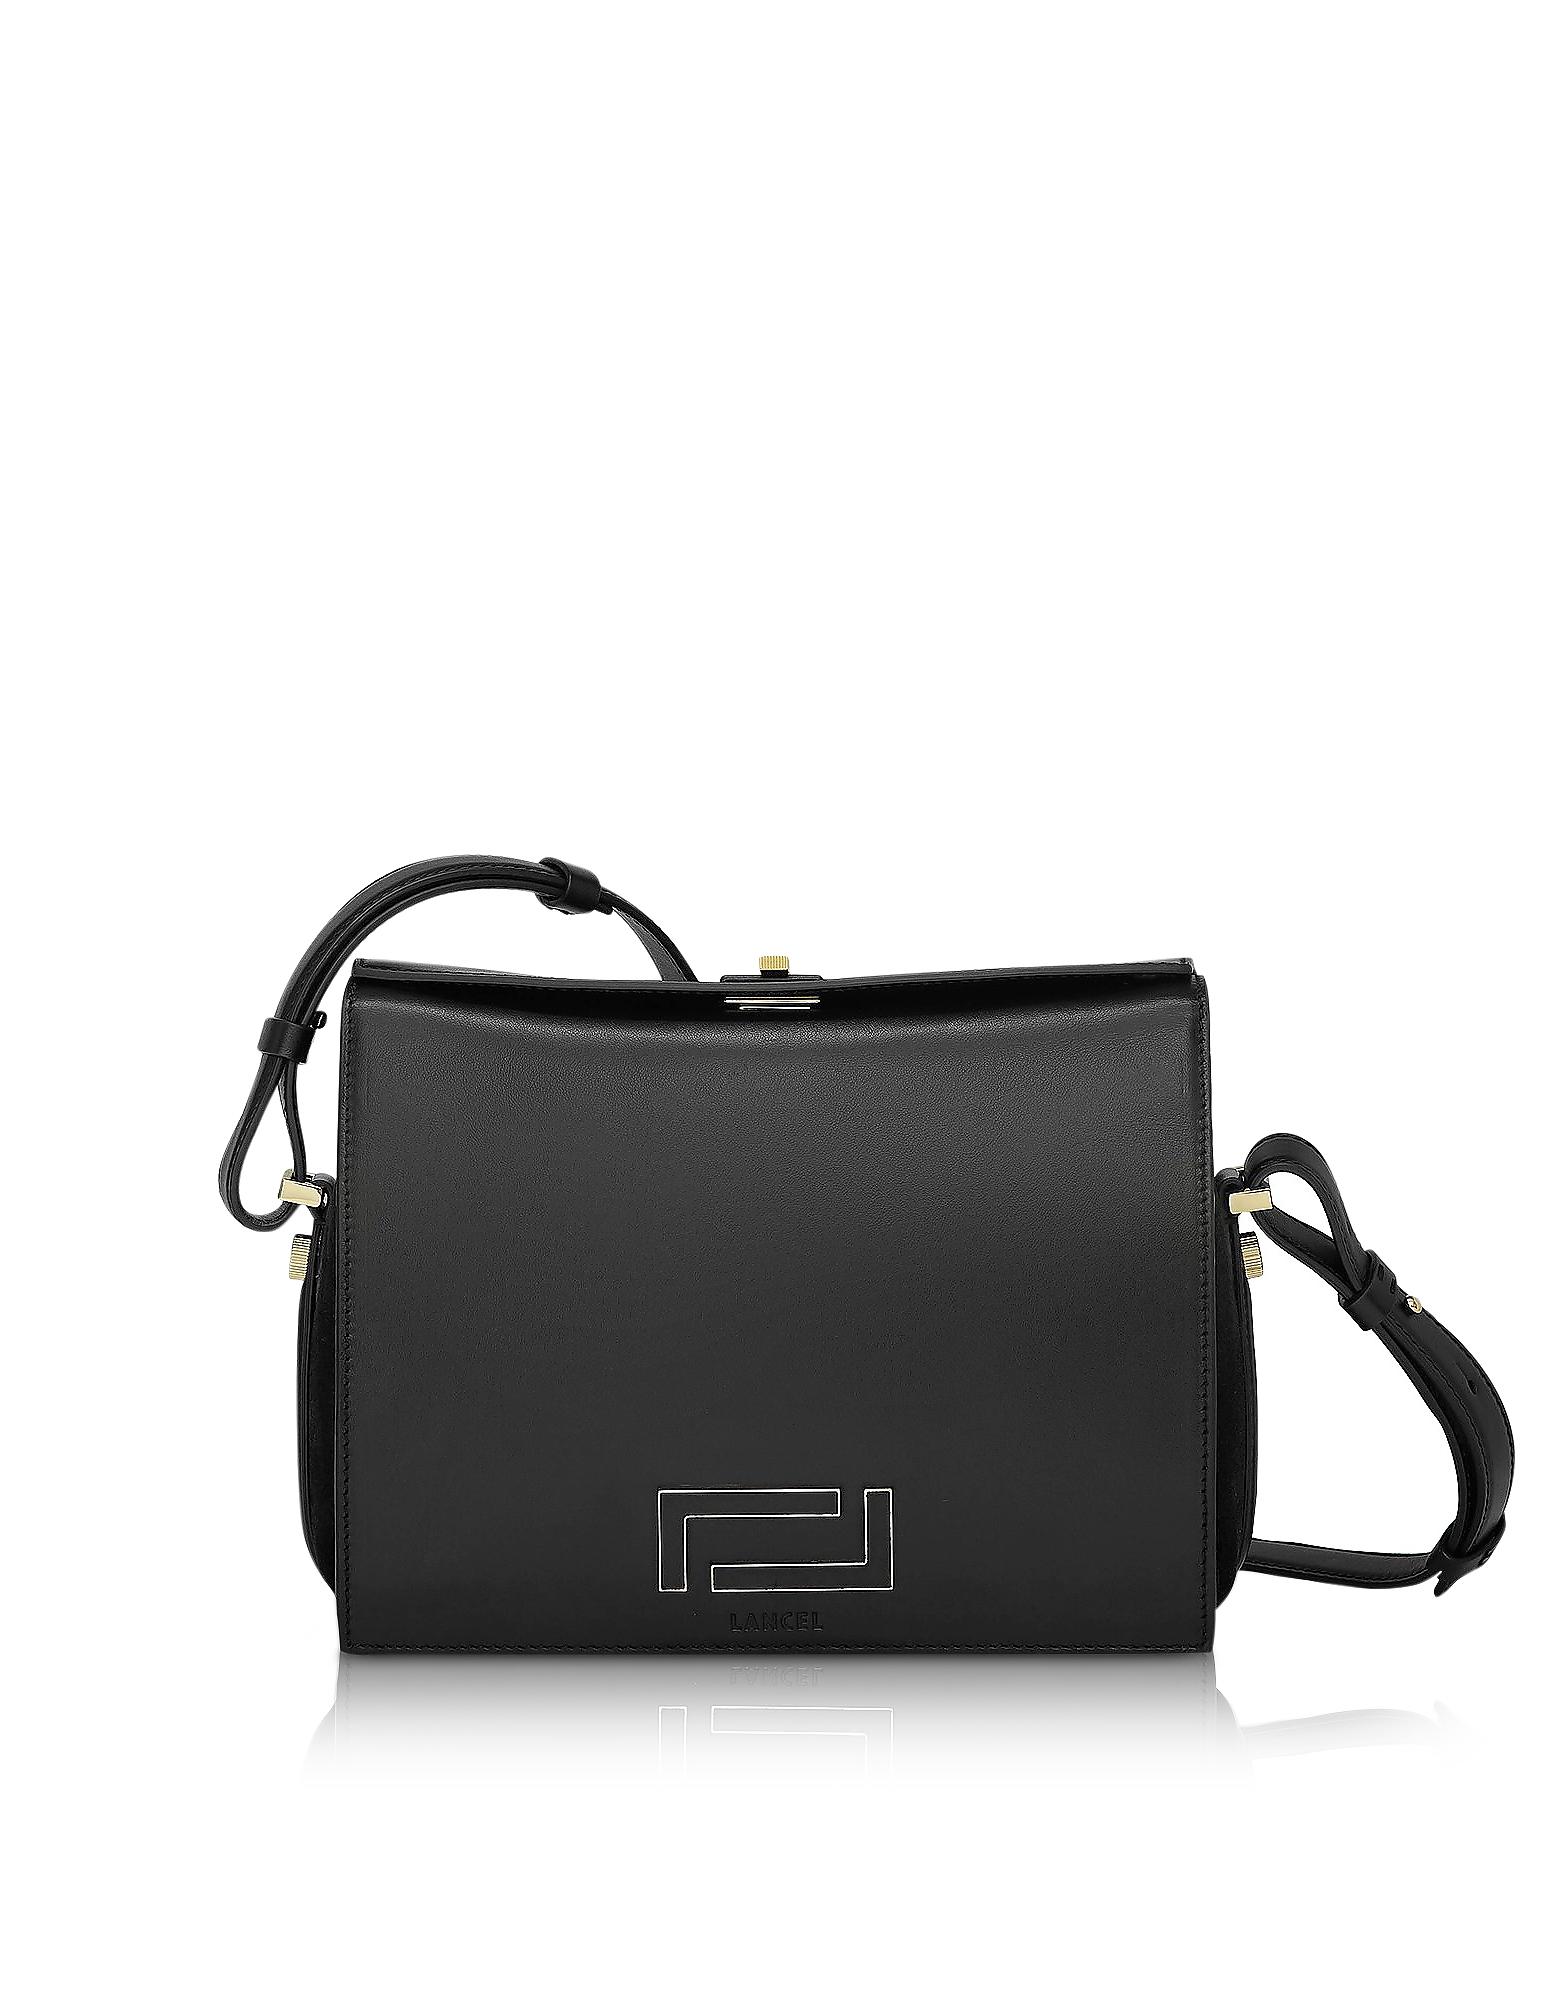 Image of Lancel Designer Handbags, Pia Black Smooth Leather and Suede Crossbody Bag